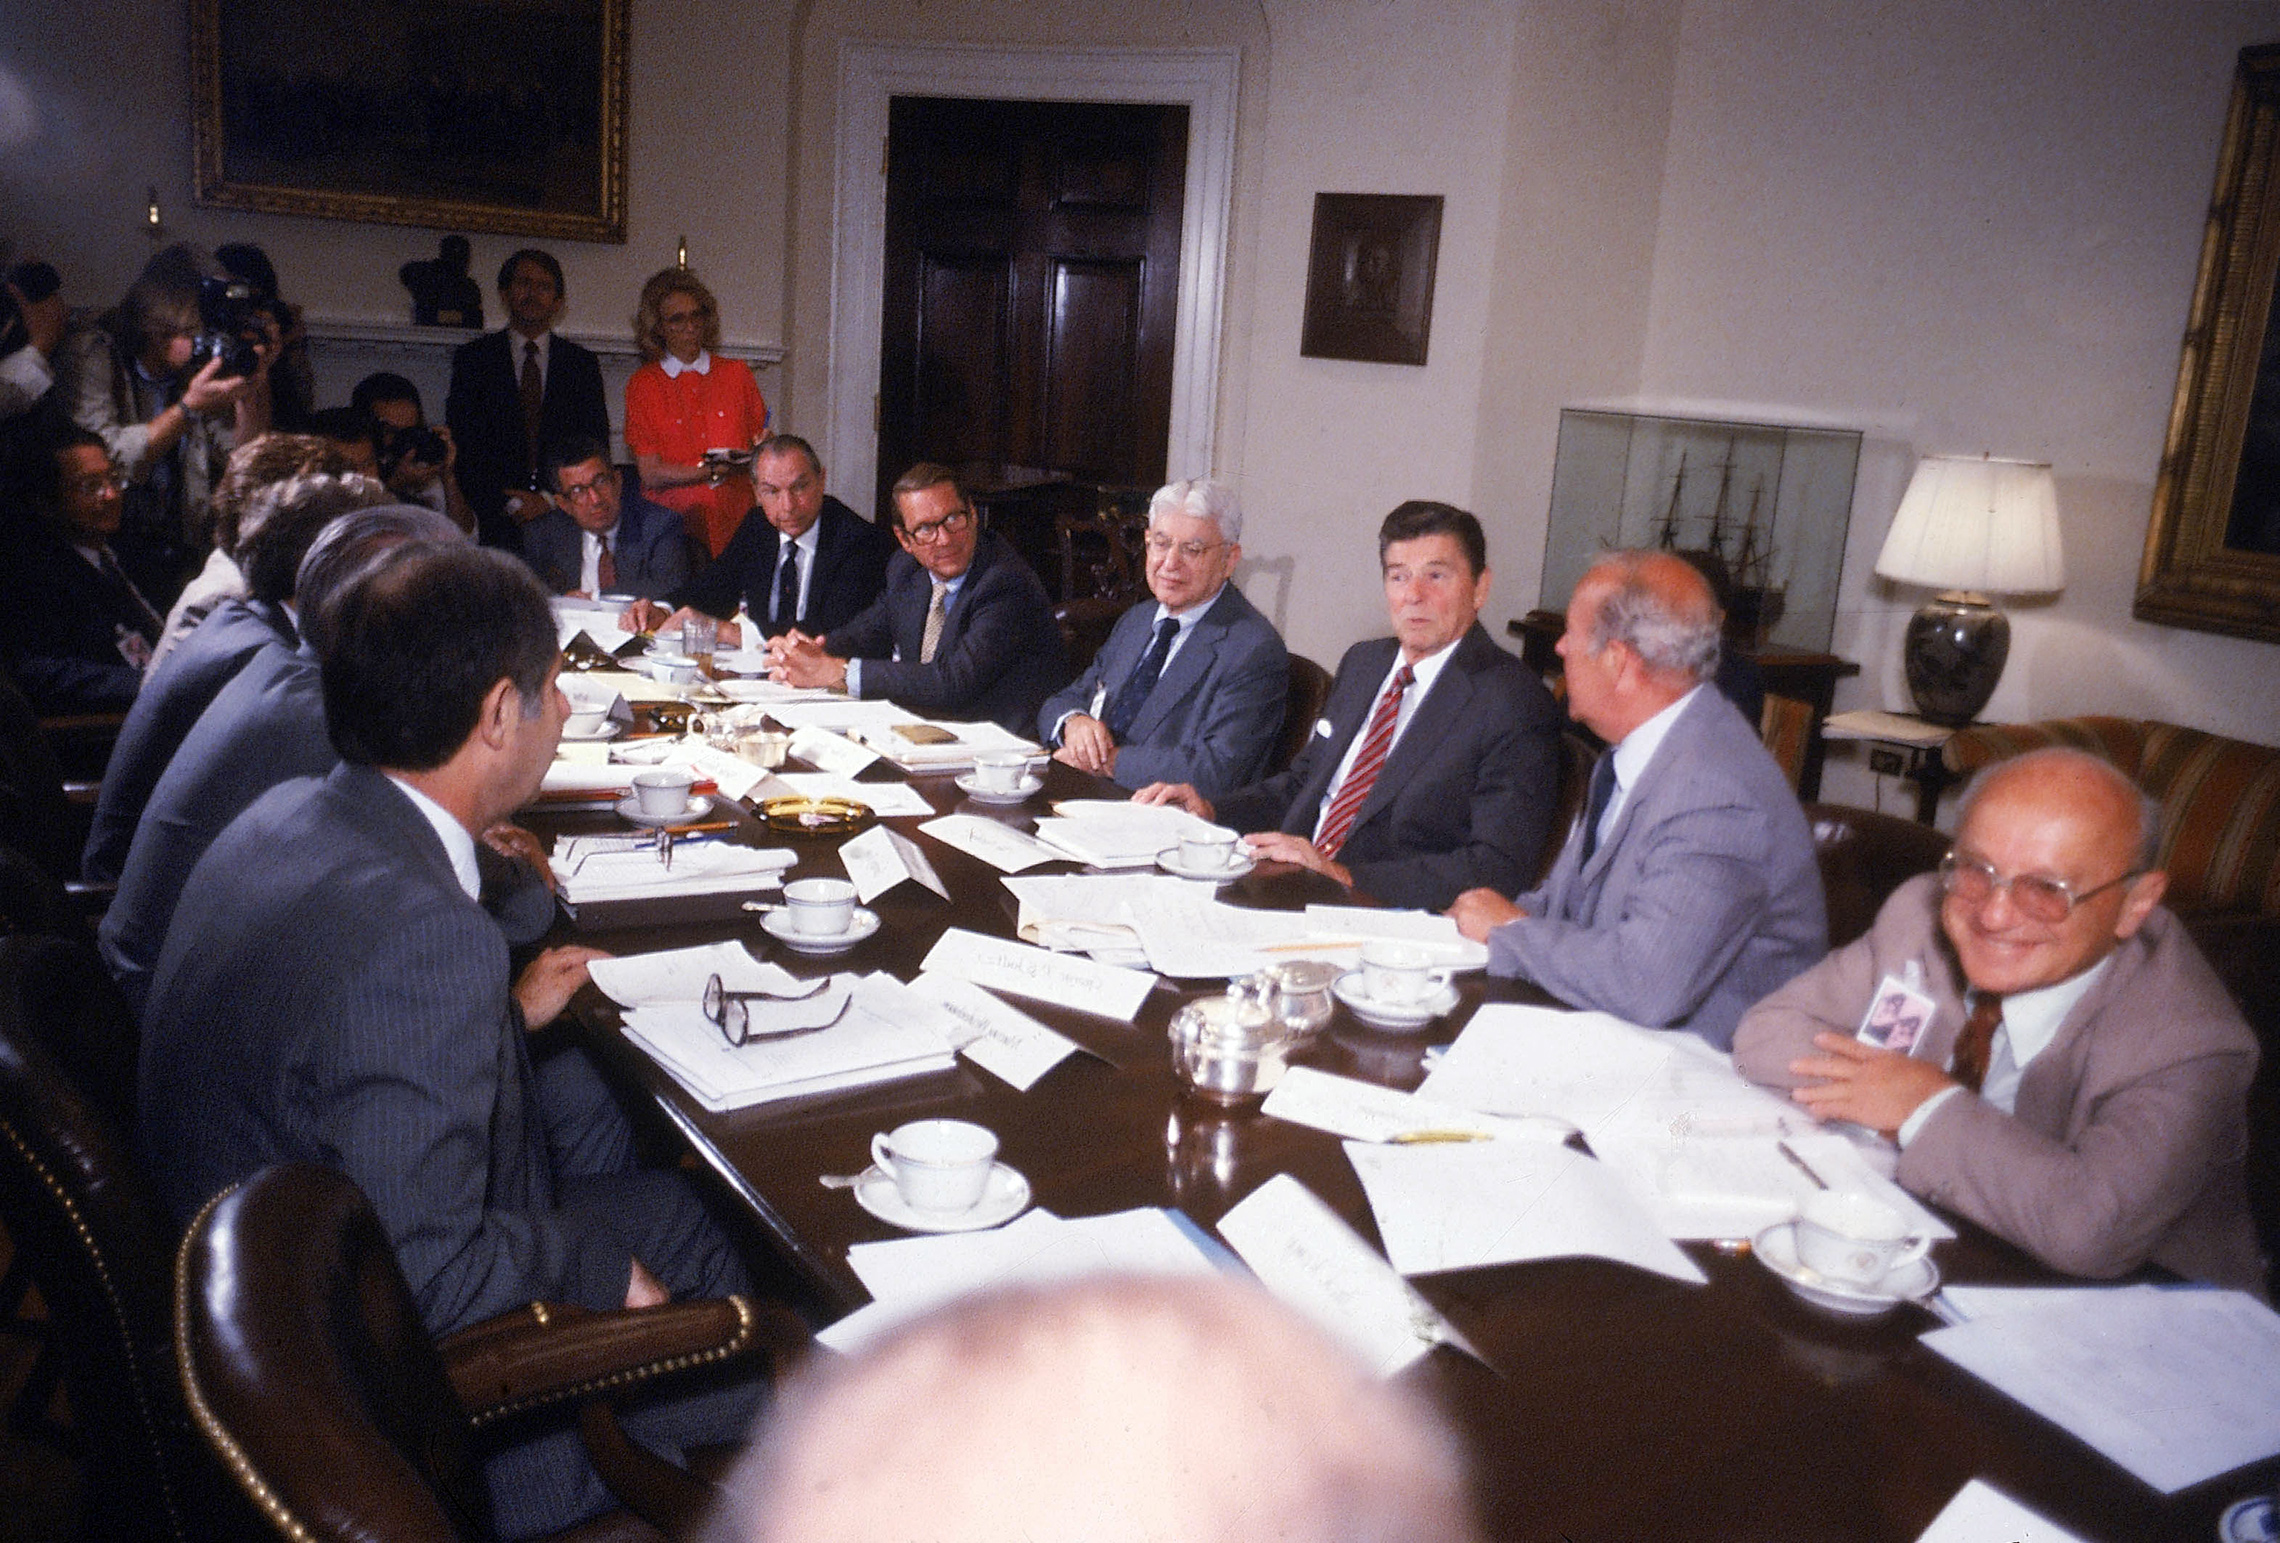 Image result for ronald reagan white house milton friedman